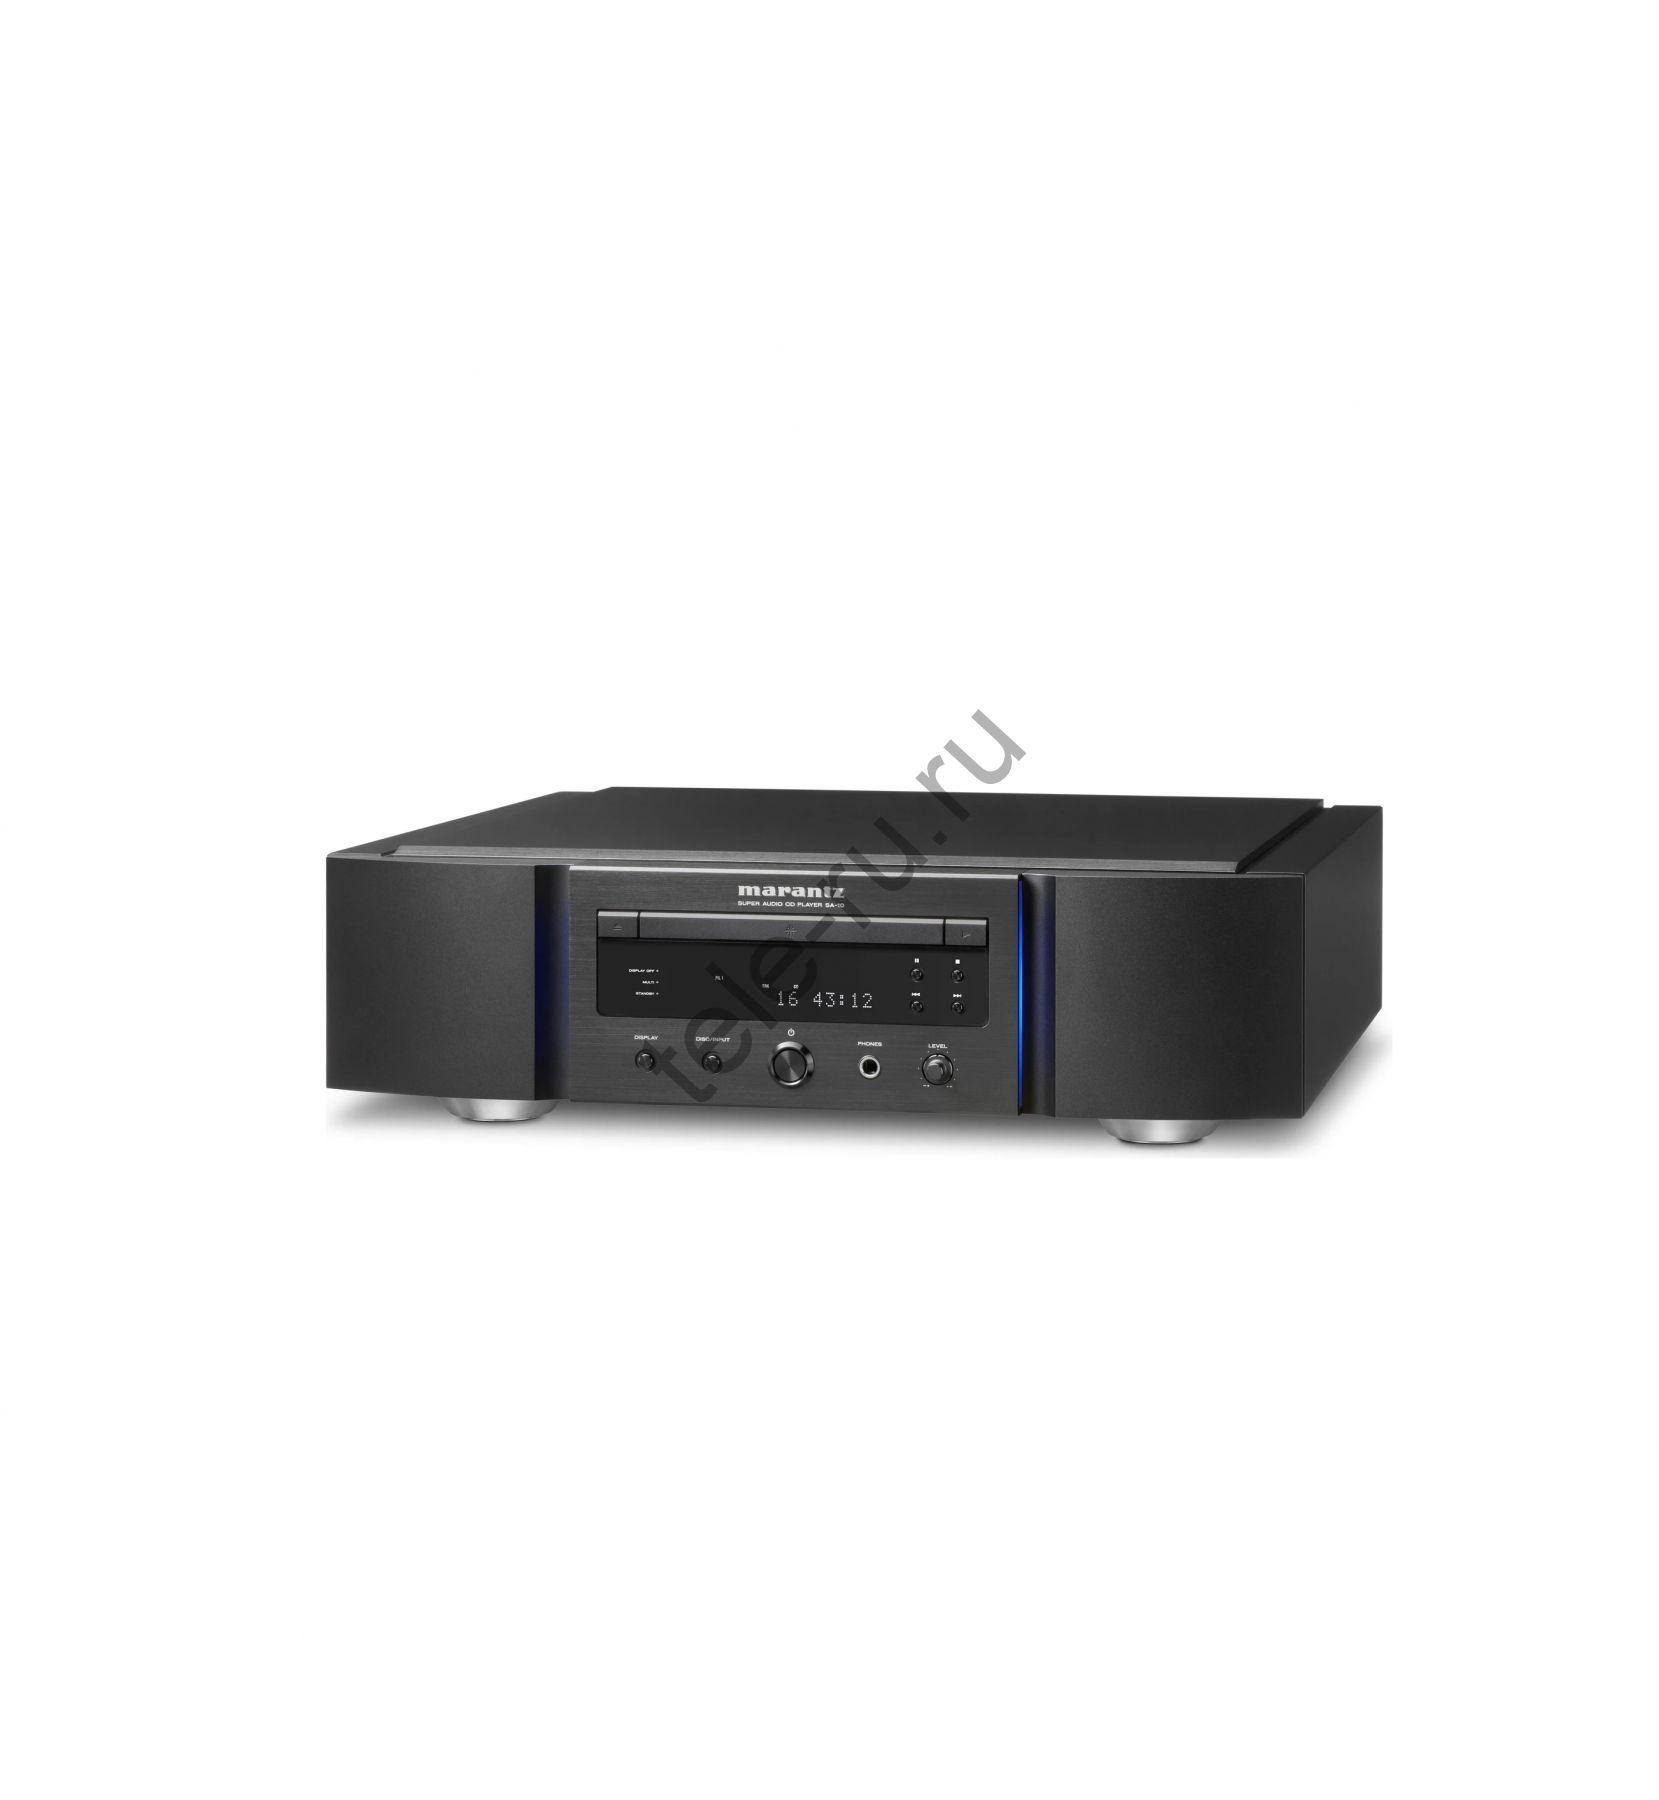 CD и SACD Проигрыватели MARANTZ SA-10, Black